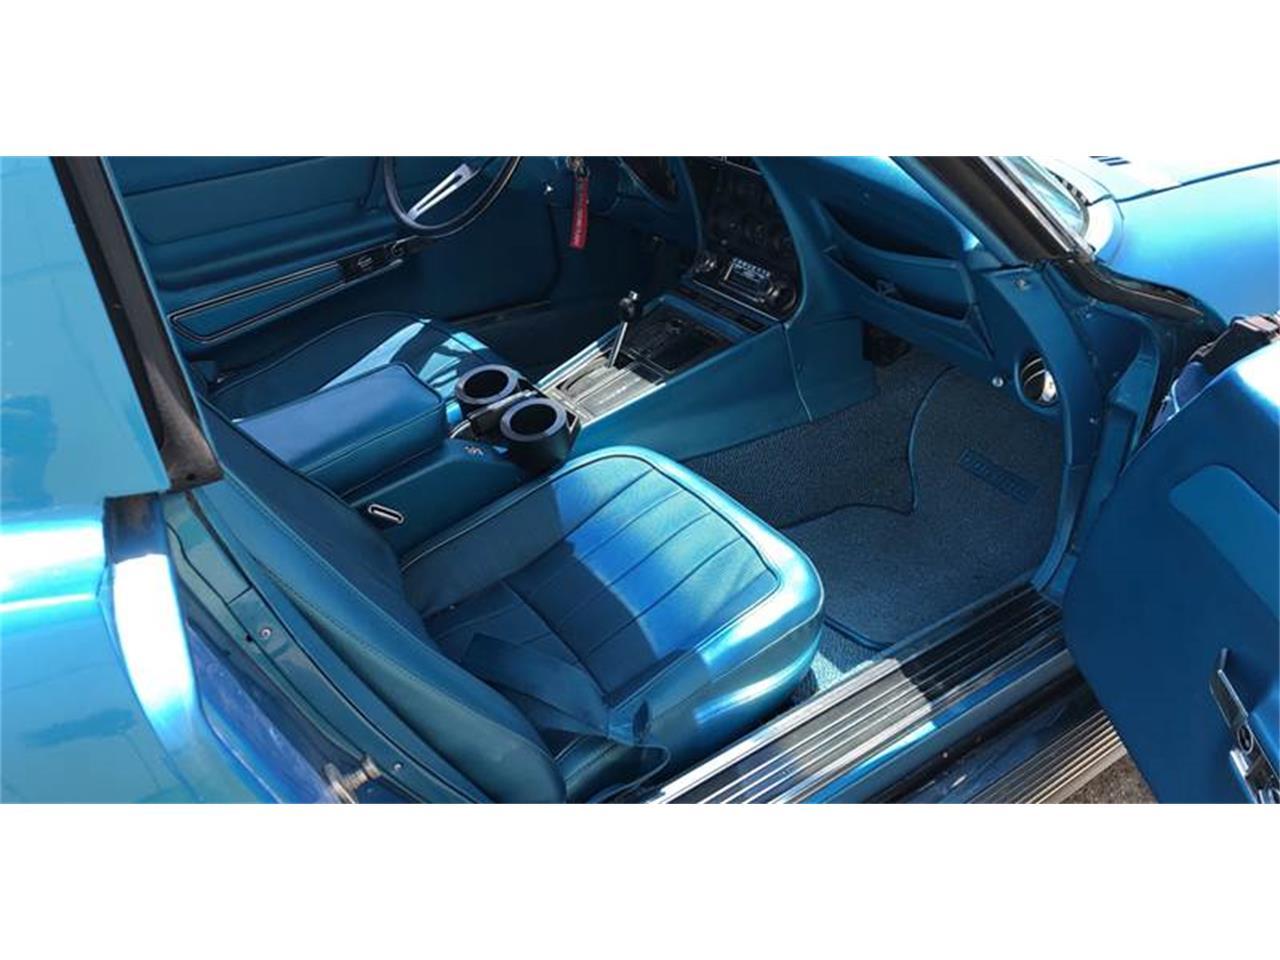 Large Picture of '69 Chevrolet Corvette located in Brea California Auction Vehicle - QEIM